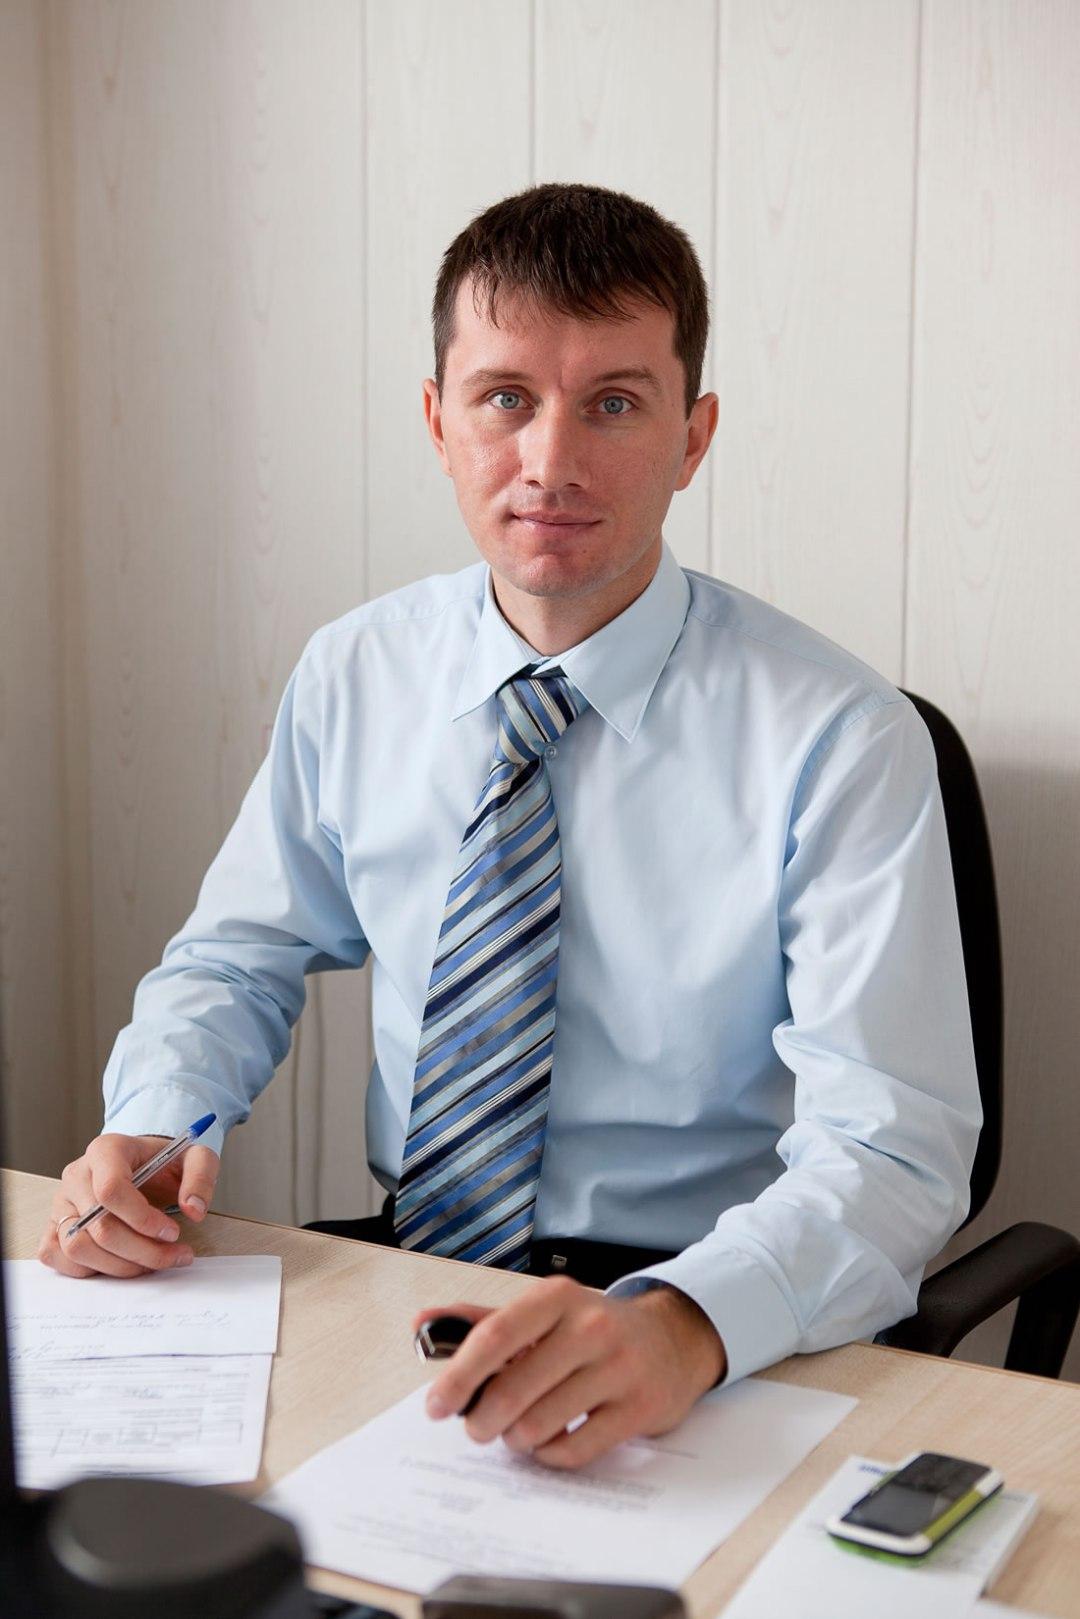 Федько Сергей Петрович